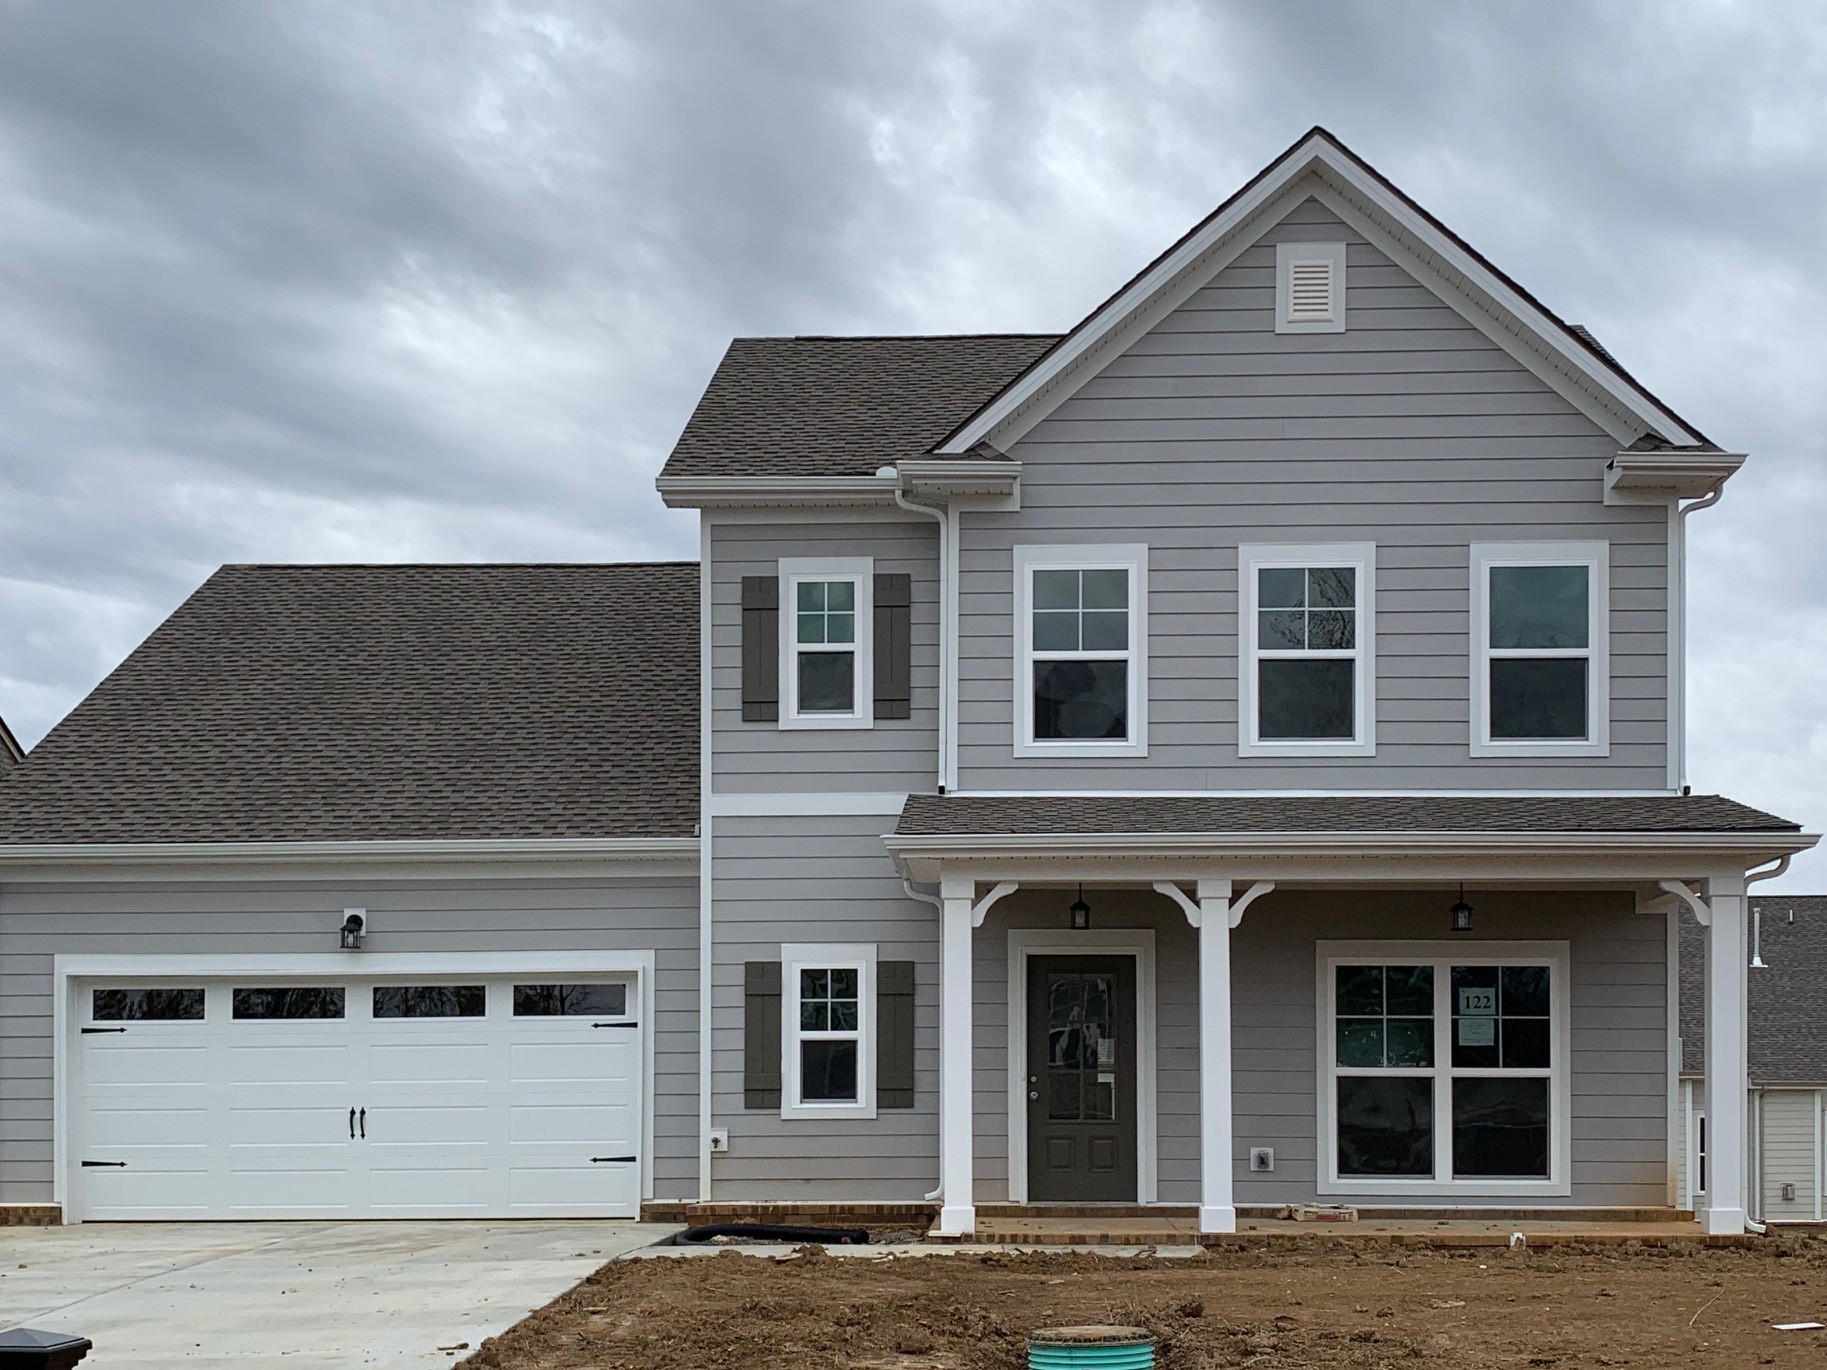 1216 Batbriar Rd #122, Murfreesboro, TN 37129 - Murfreesboro, TN real estate listing